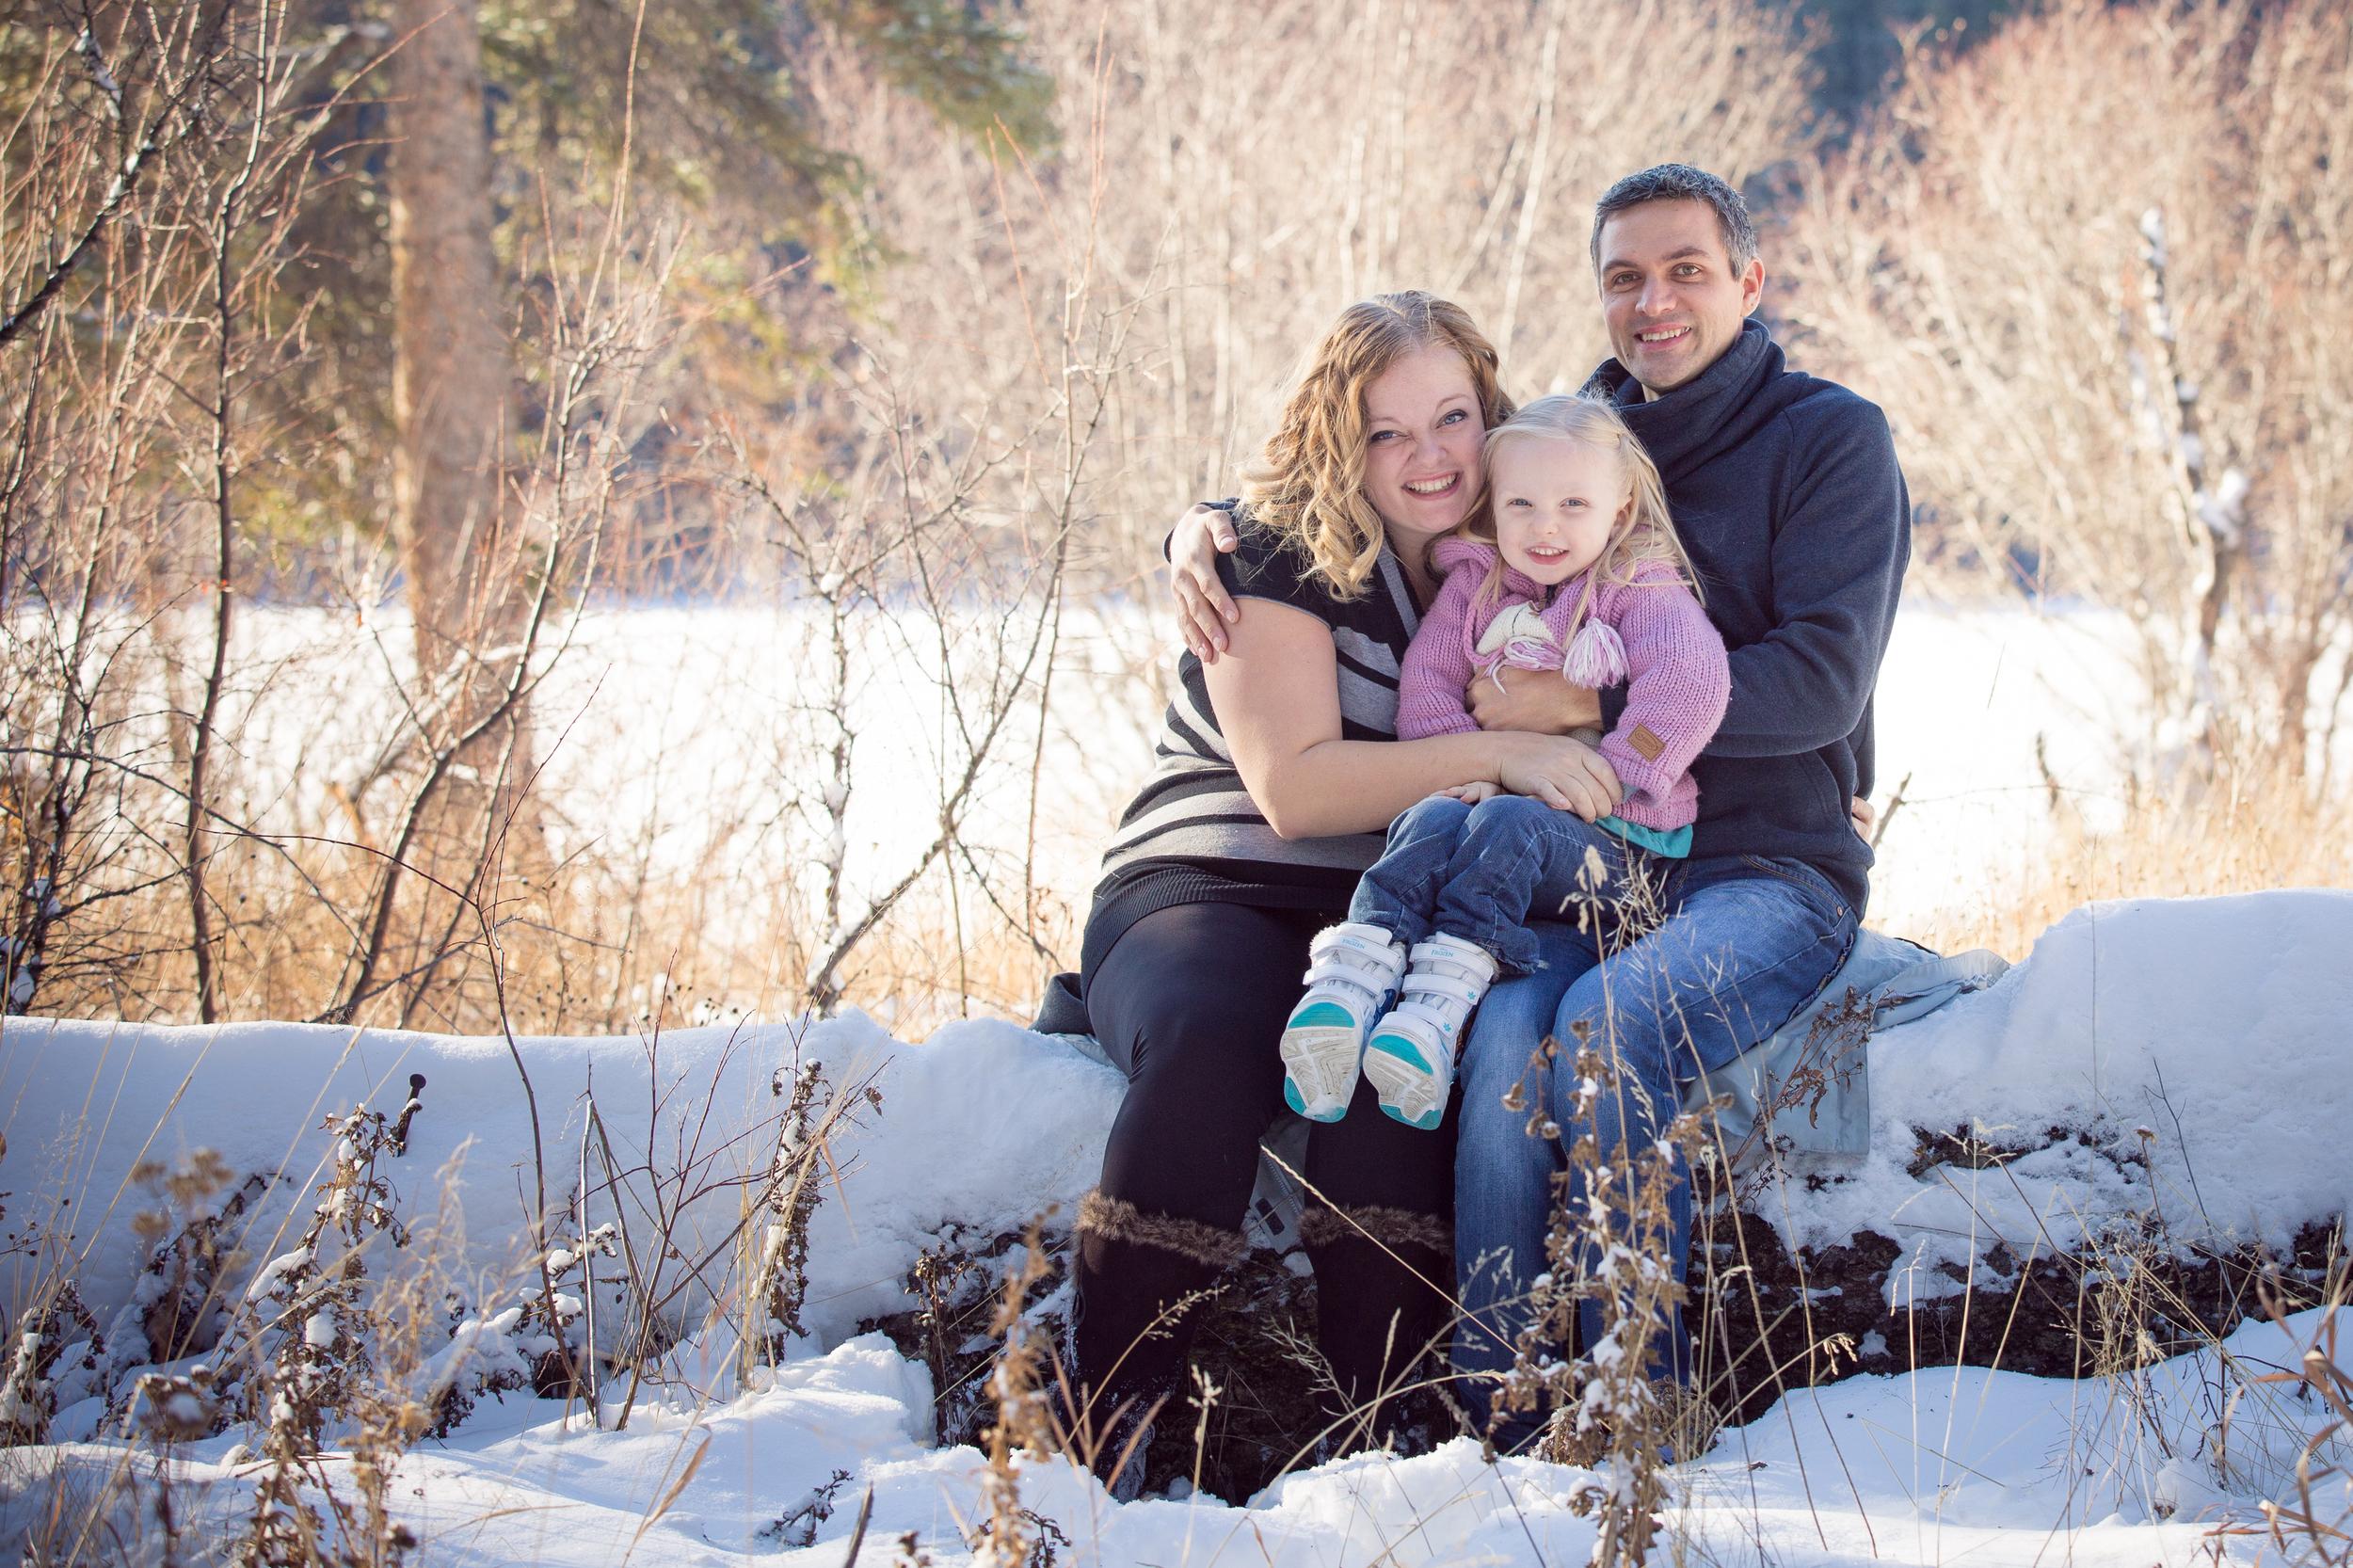 lightfootfamily-2.jpg